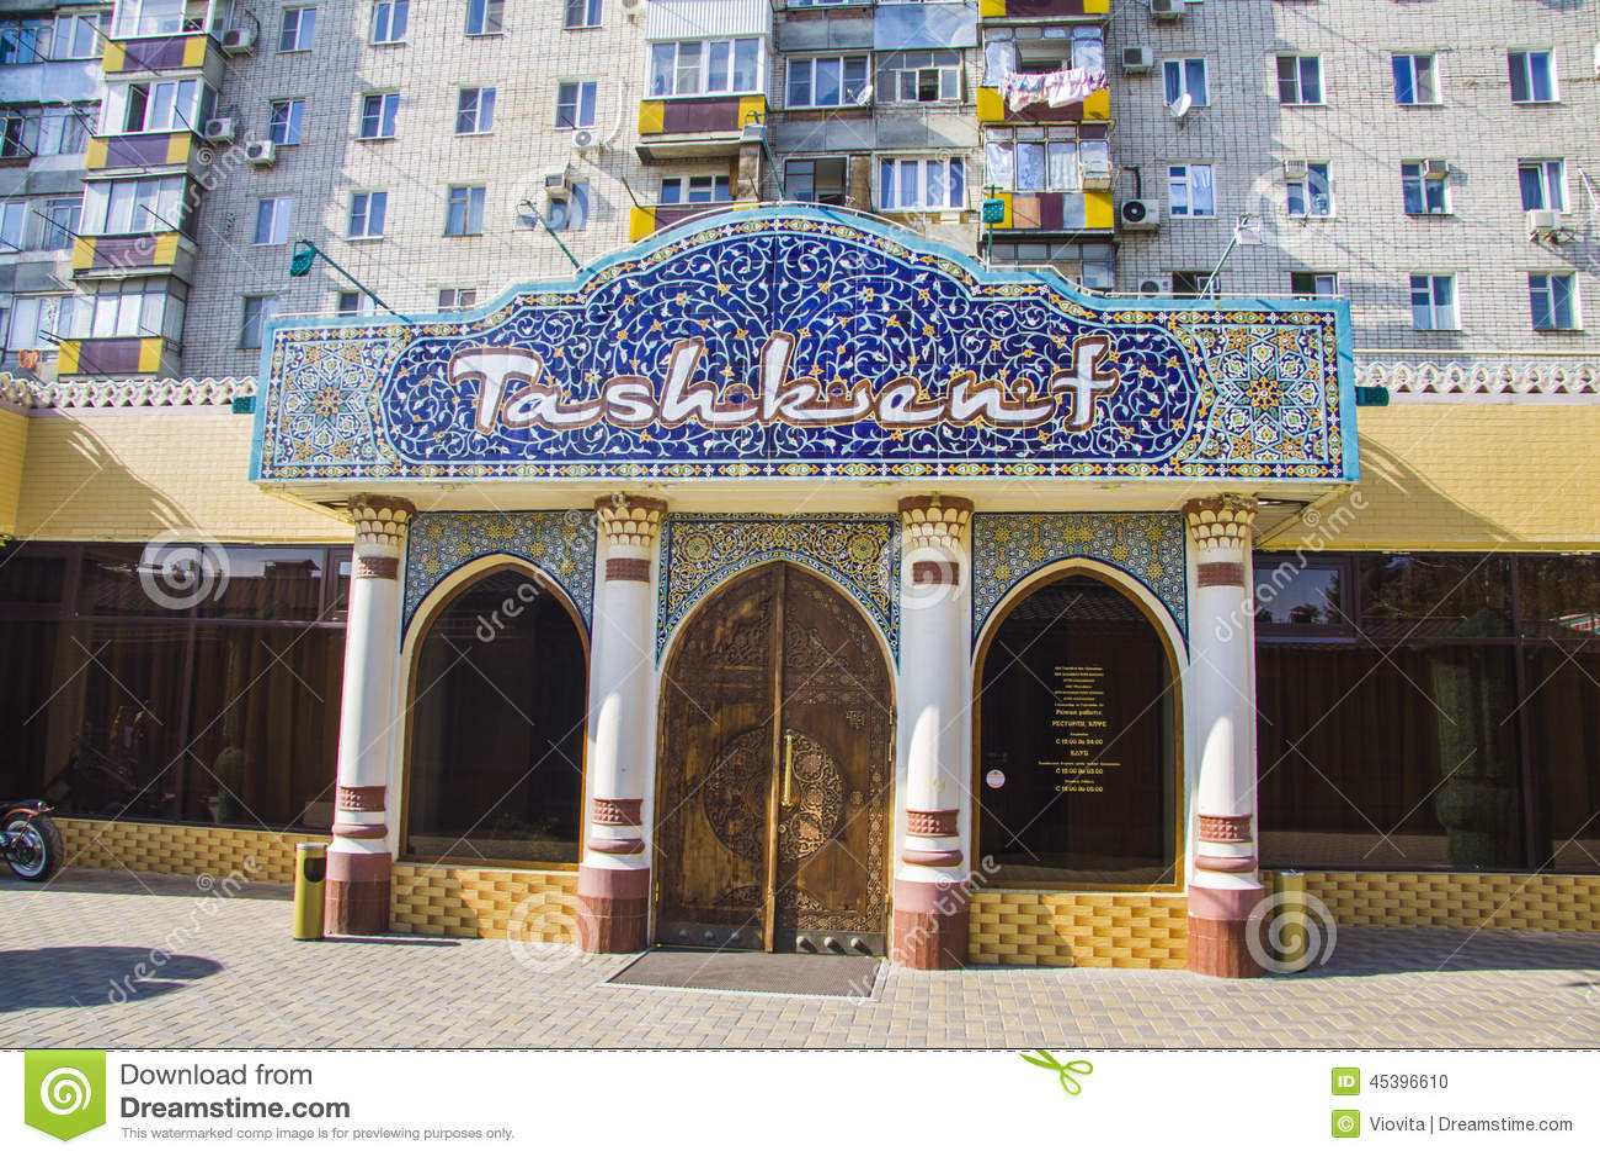 Oriental Cafe At Krasnodar Editorial Image Image Of Irish 45396610